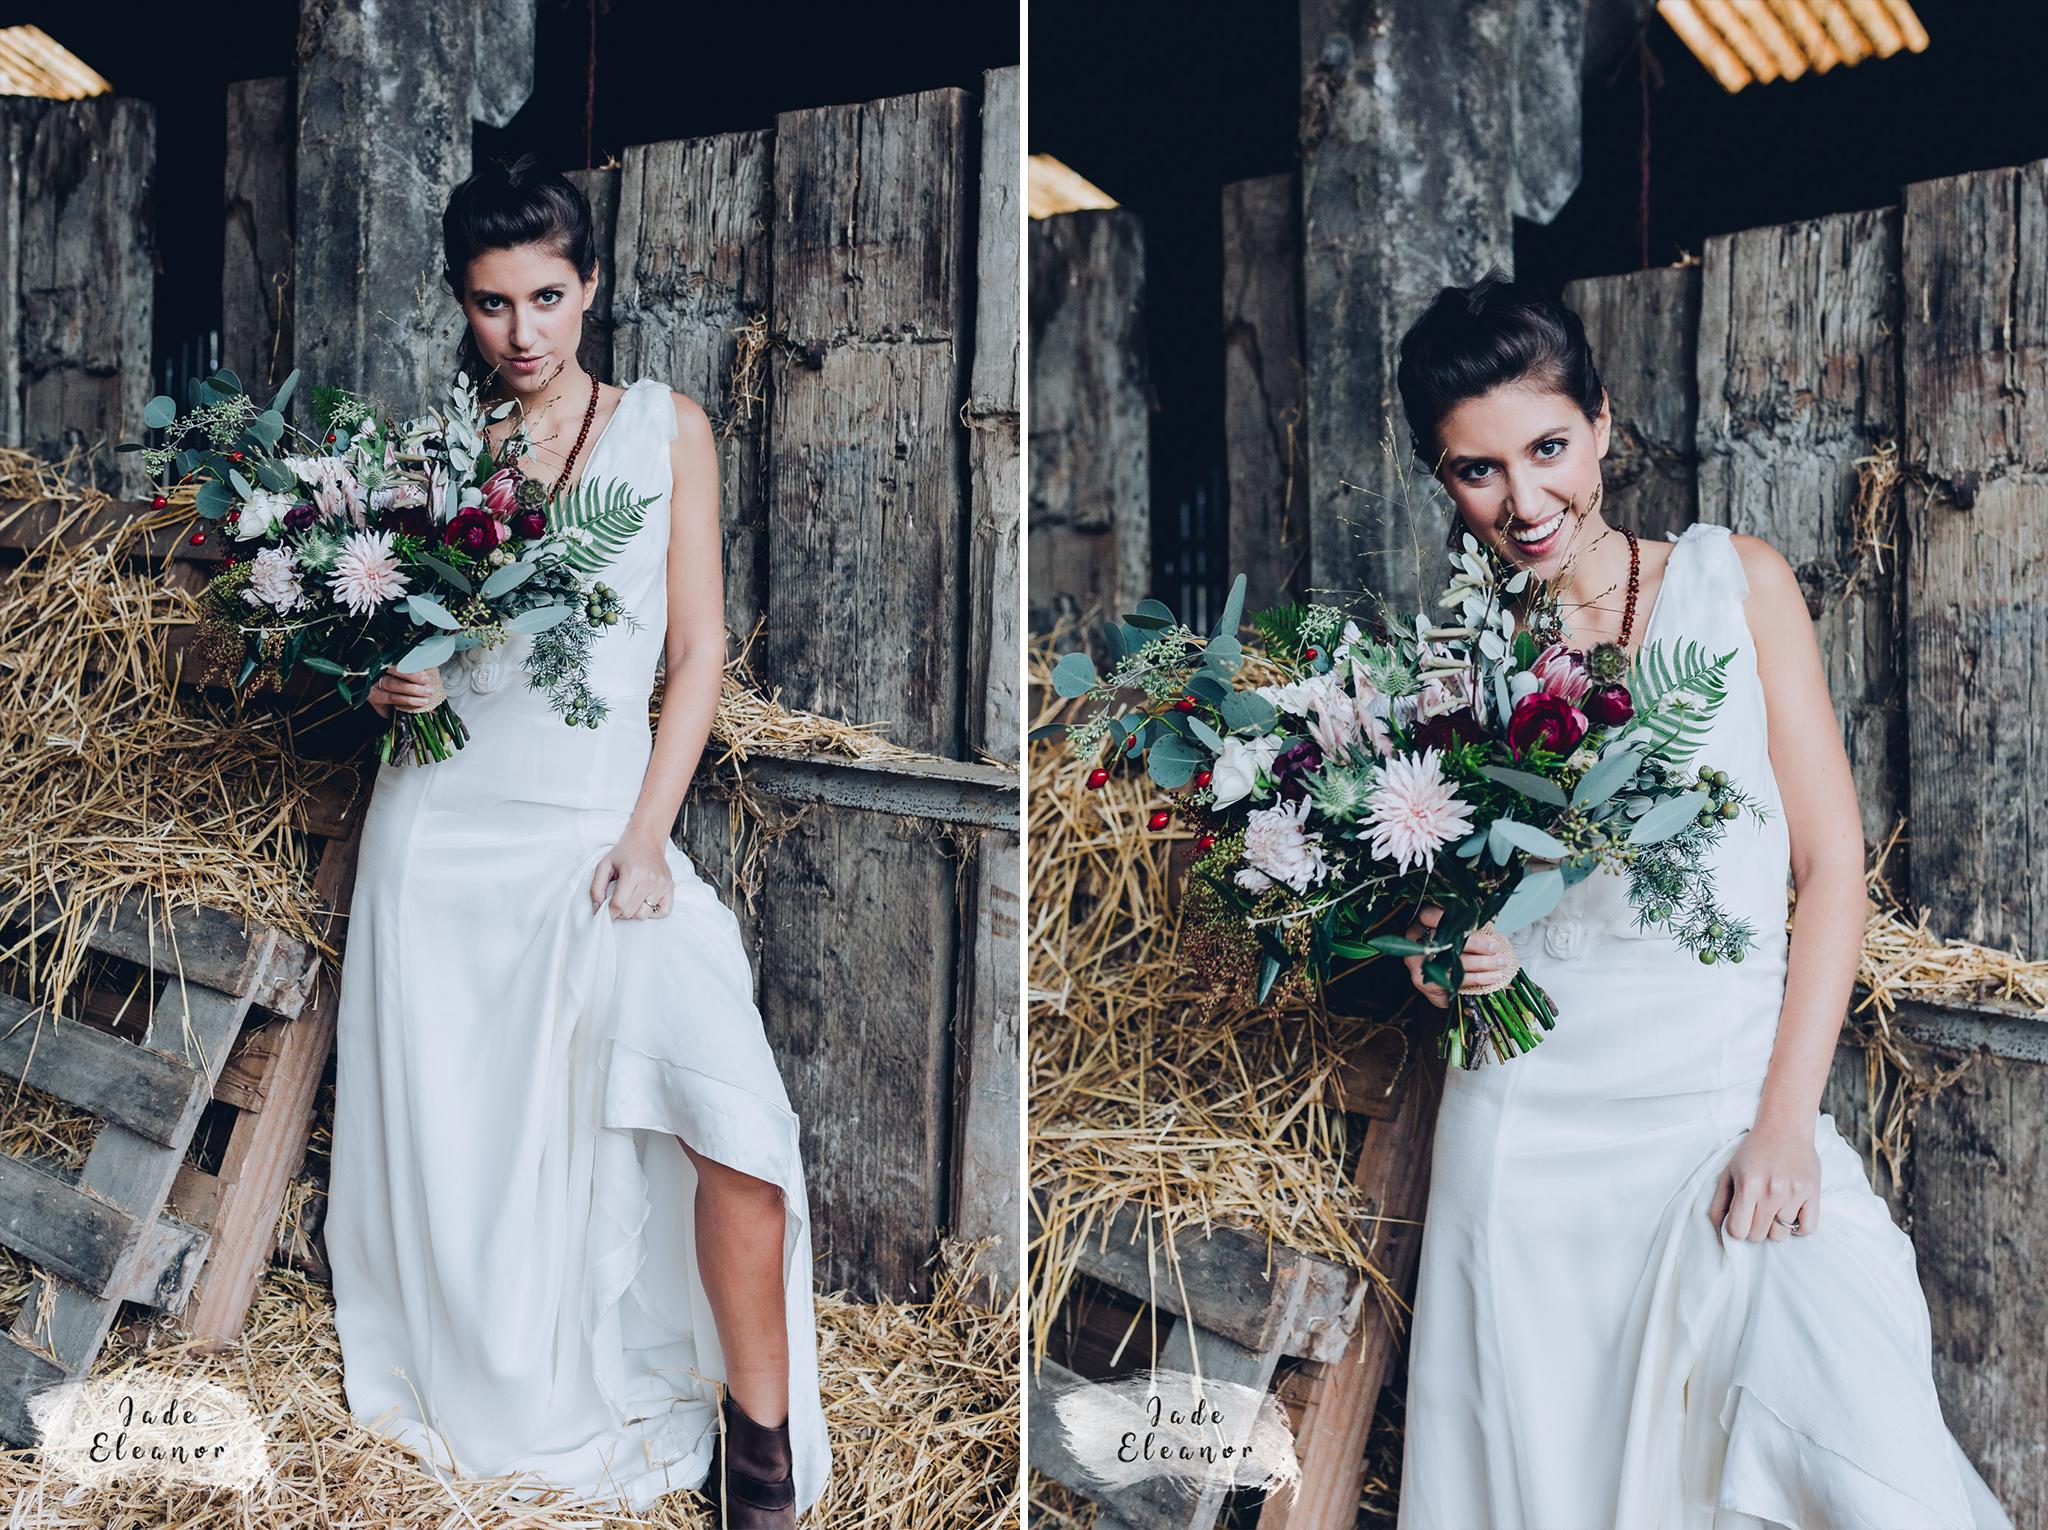 Bysshe Court Barn Wedding Jade Eleanor Photography 15&16.jpg